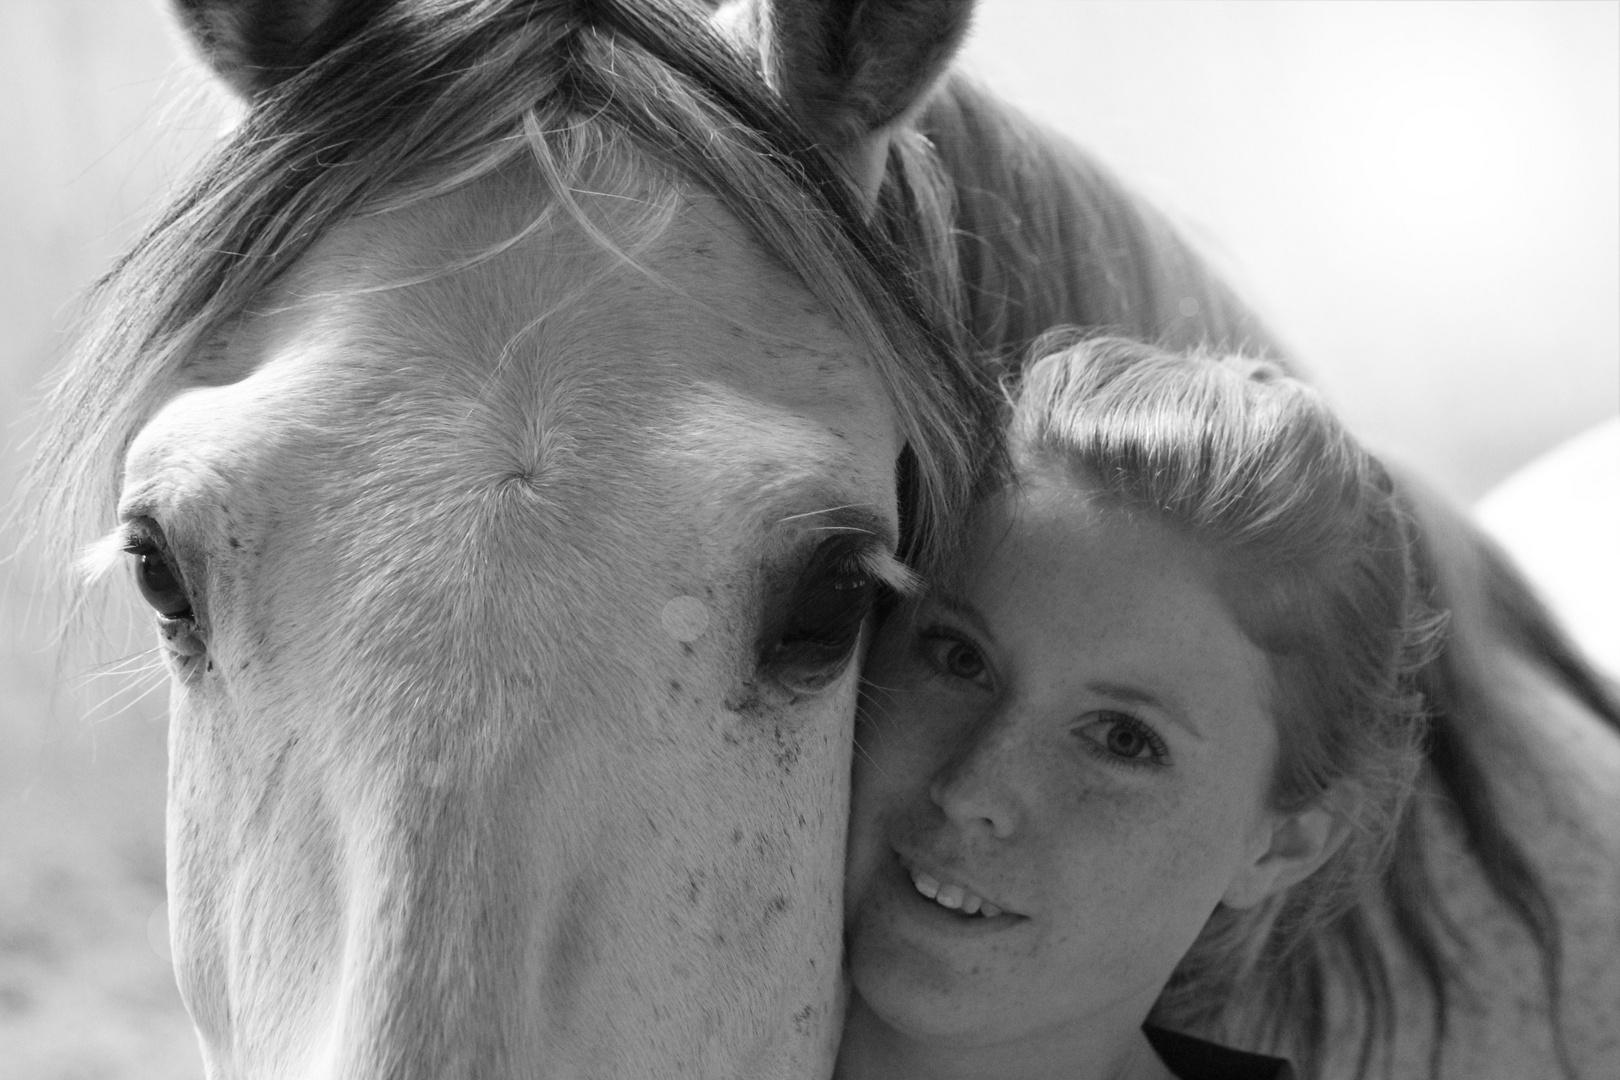 Das Pferd bleibt dir im Sturme treu -